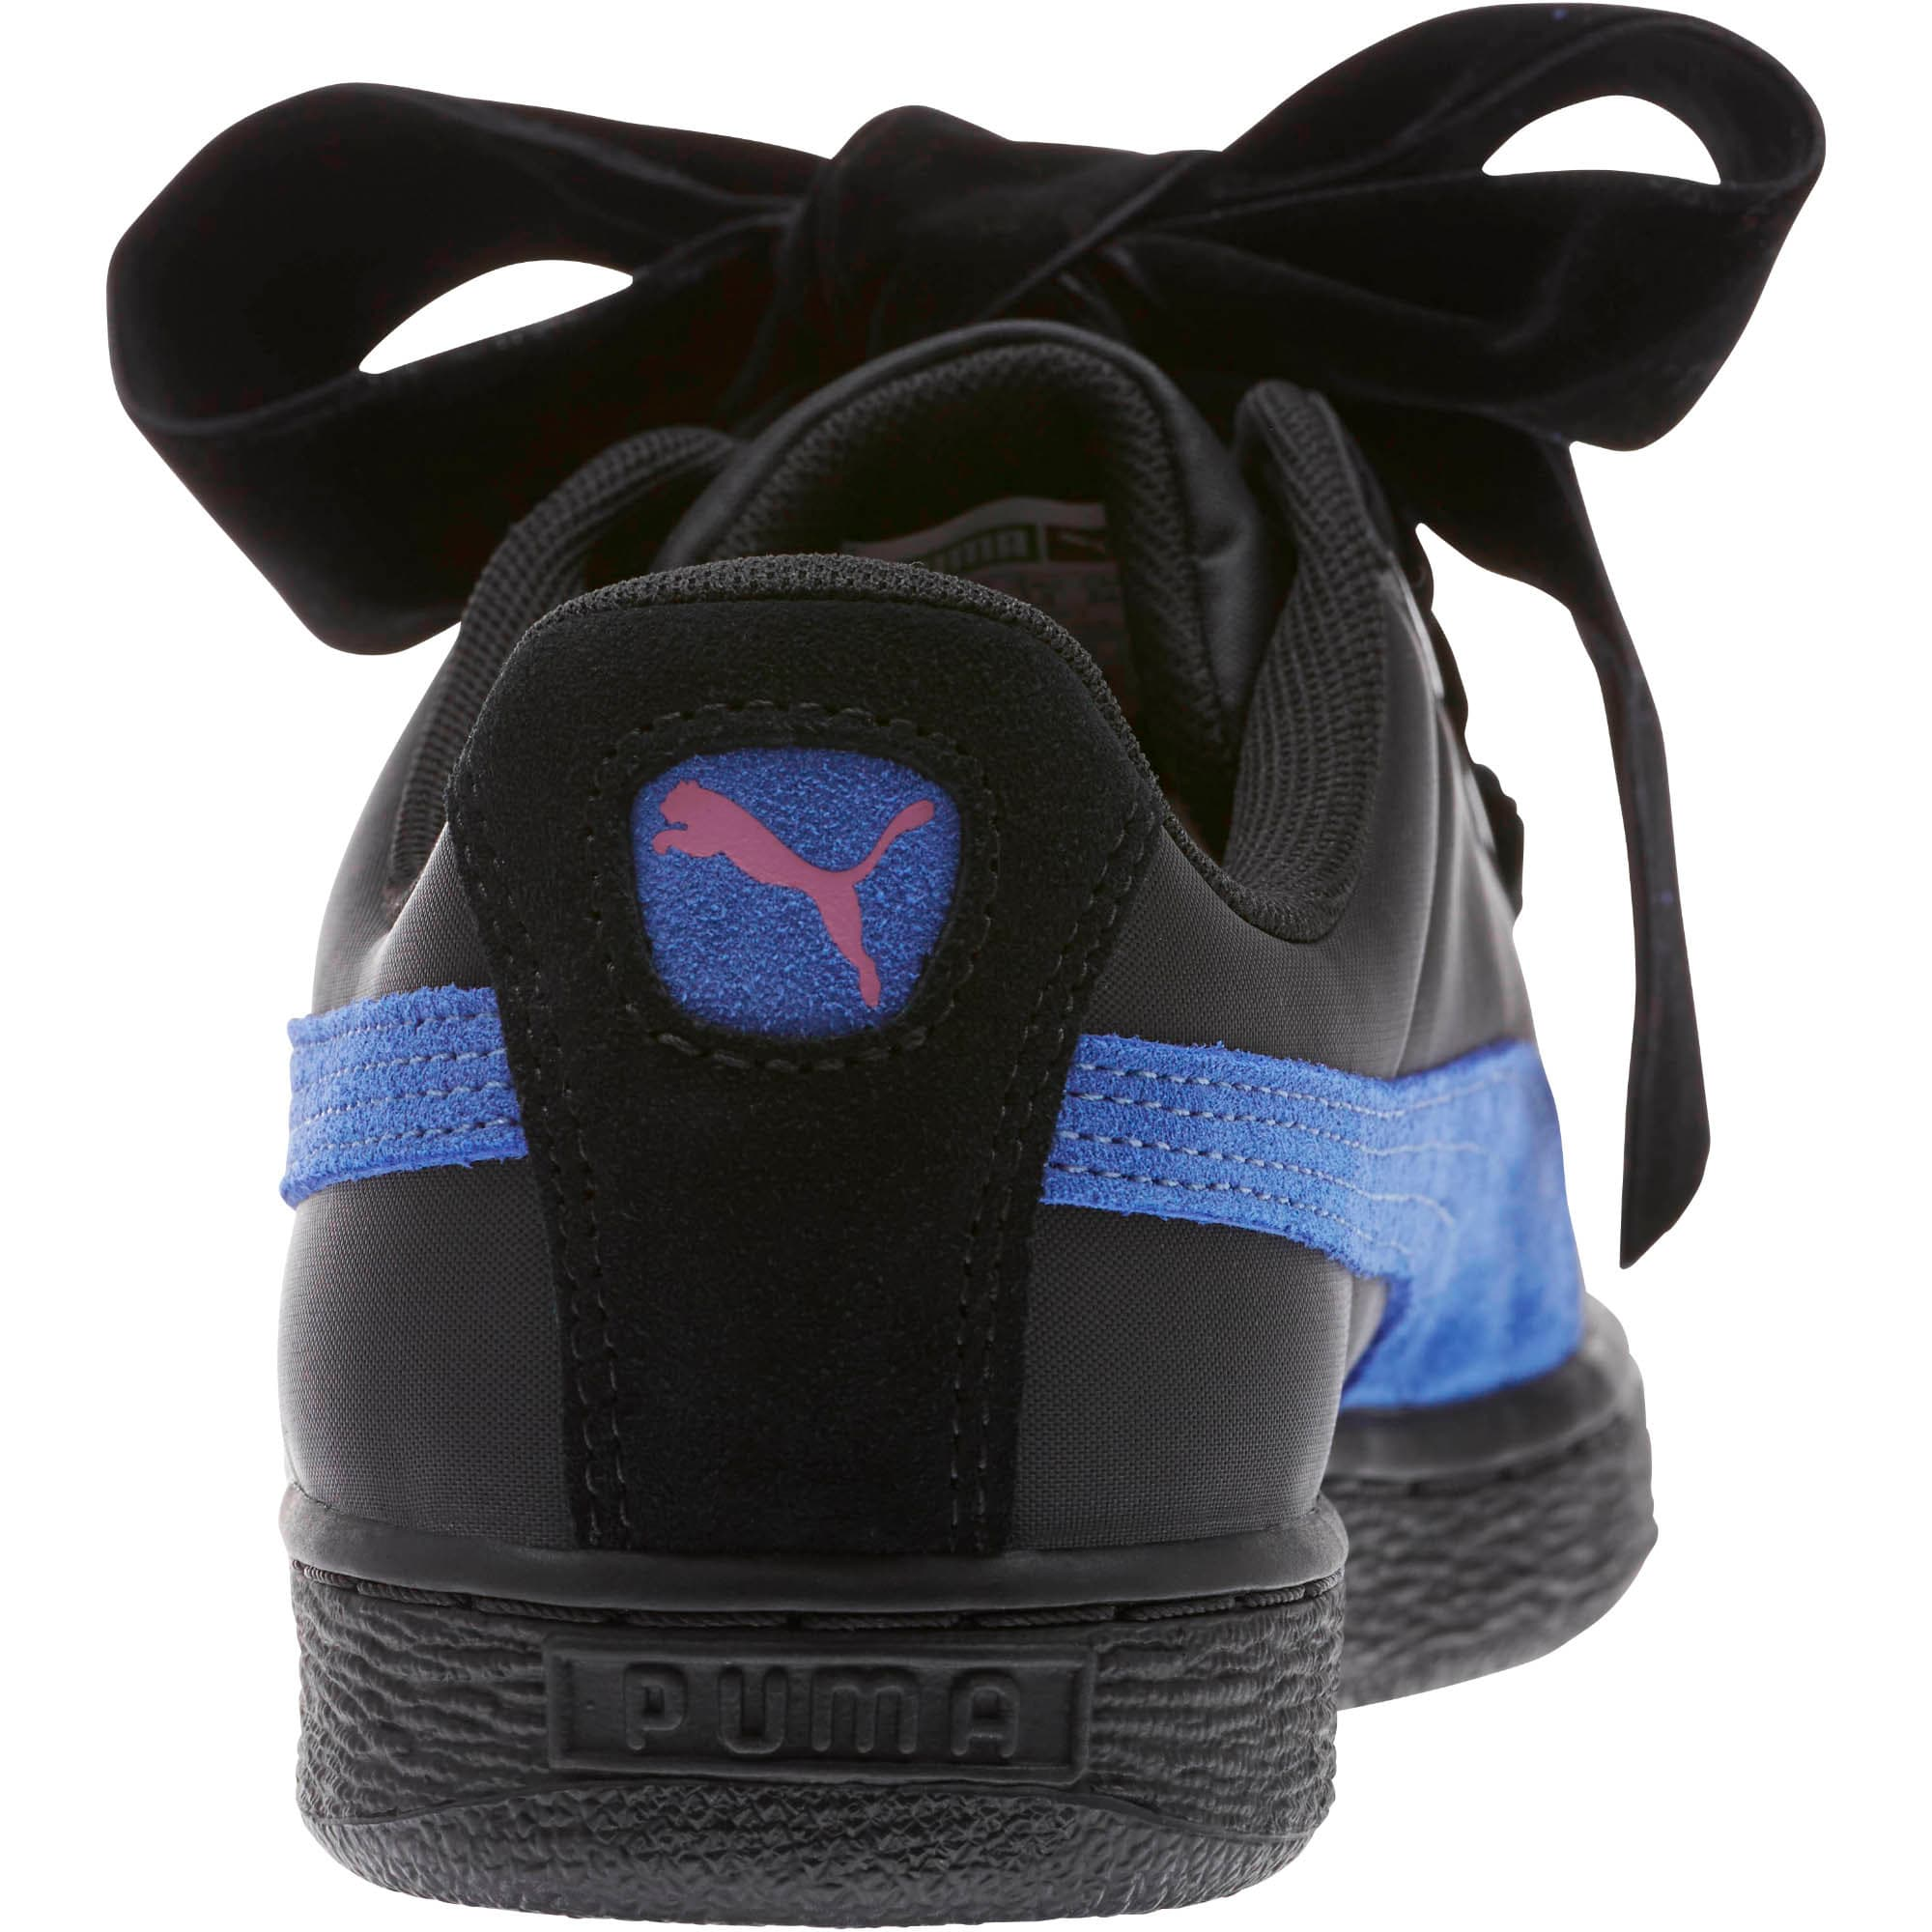 Thumbnail 4 of Basket Heart Nylon Women's Sneakers, Puma Black-Baja Blue, medium